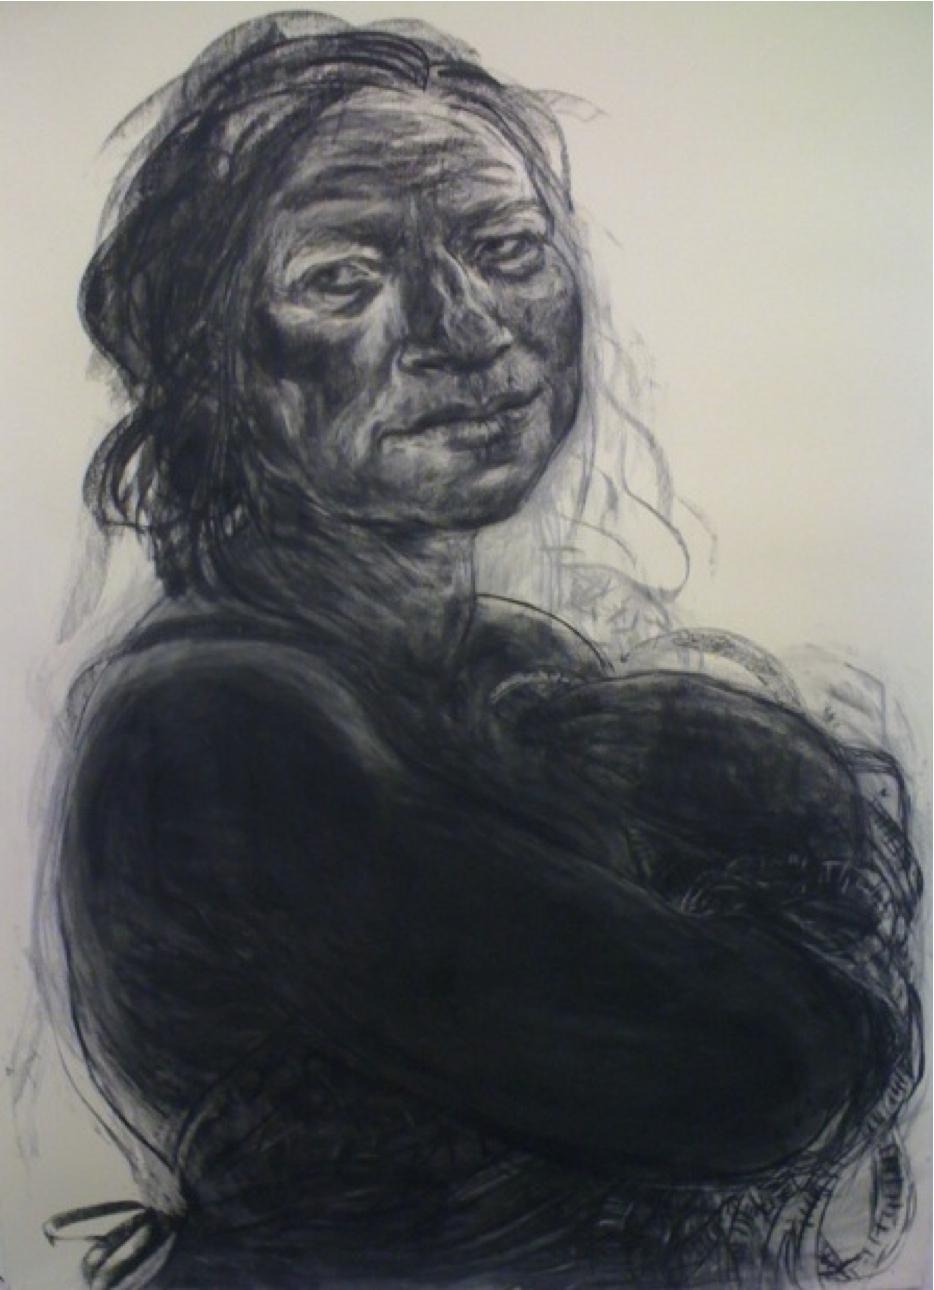 3) Anita Taylor, Vestiges, charcoal on paper, 220 x 155cm, 2012 - Interalia  MagazineInteralia Magazine